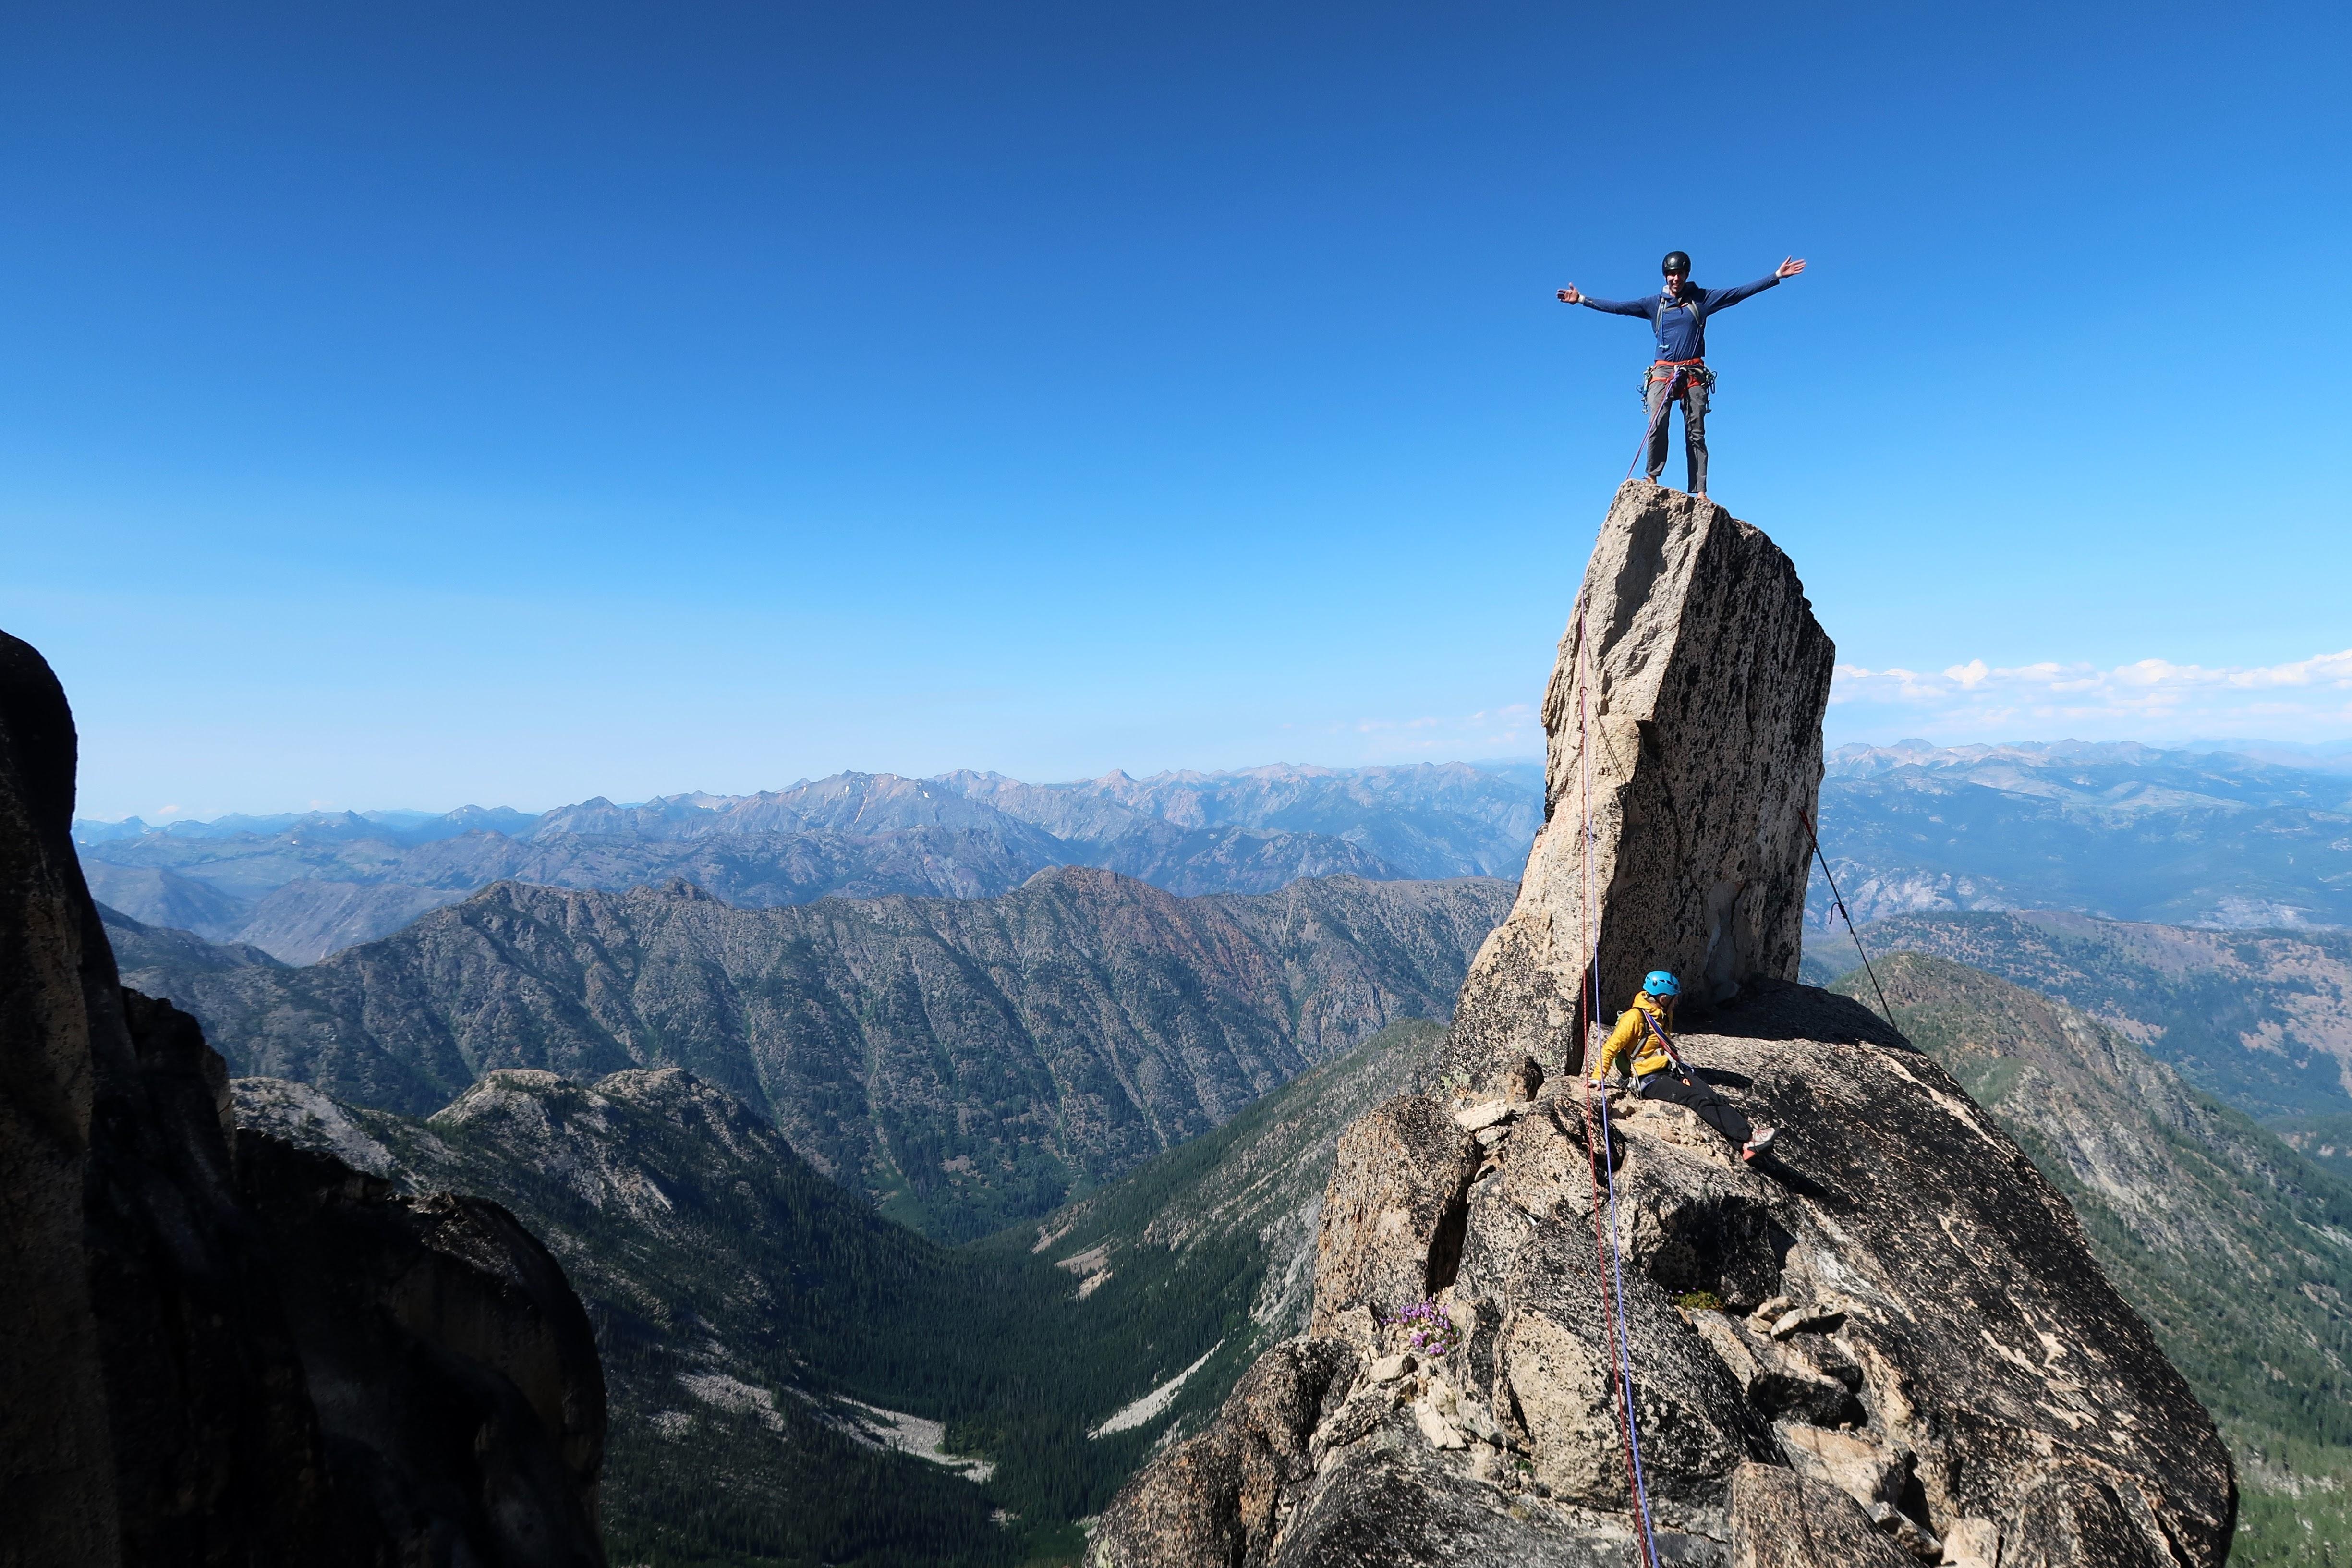 Chianti Spire summit